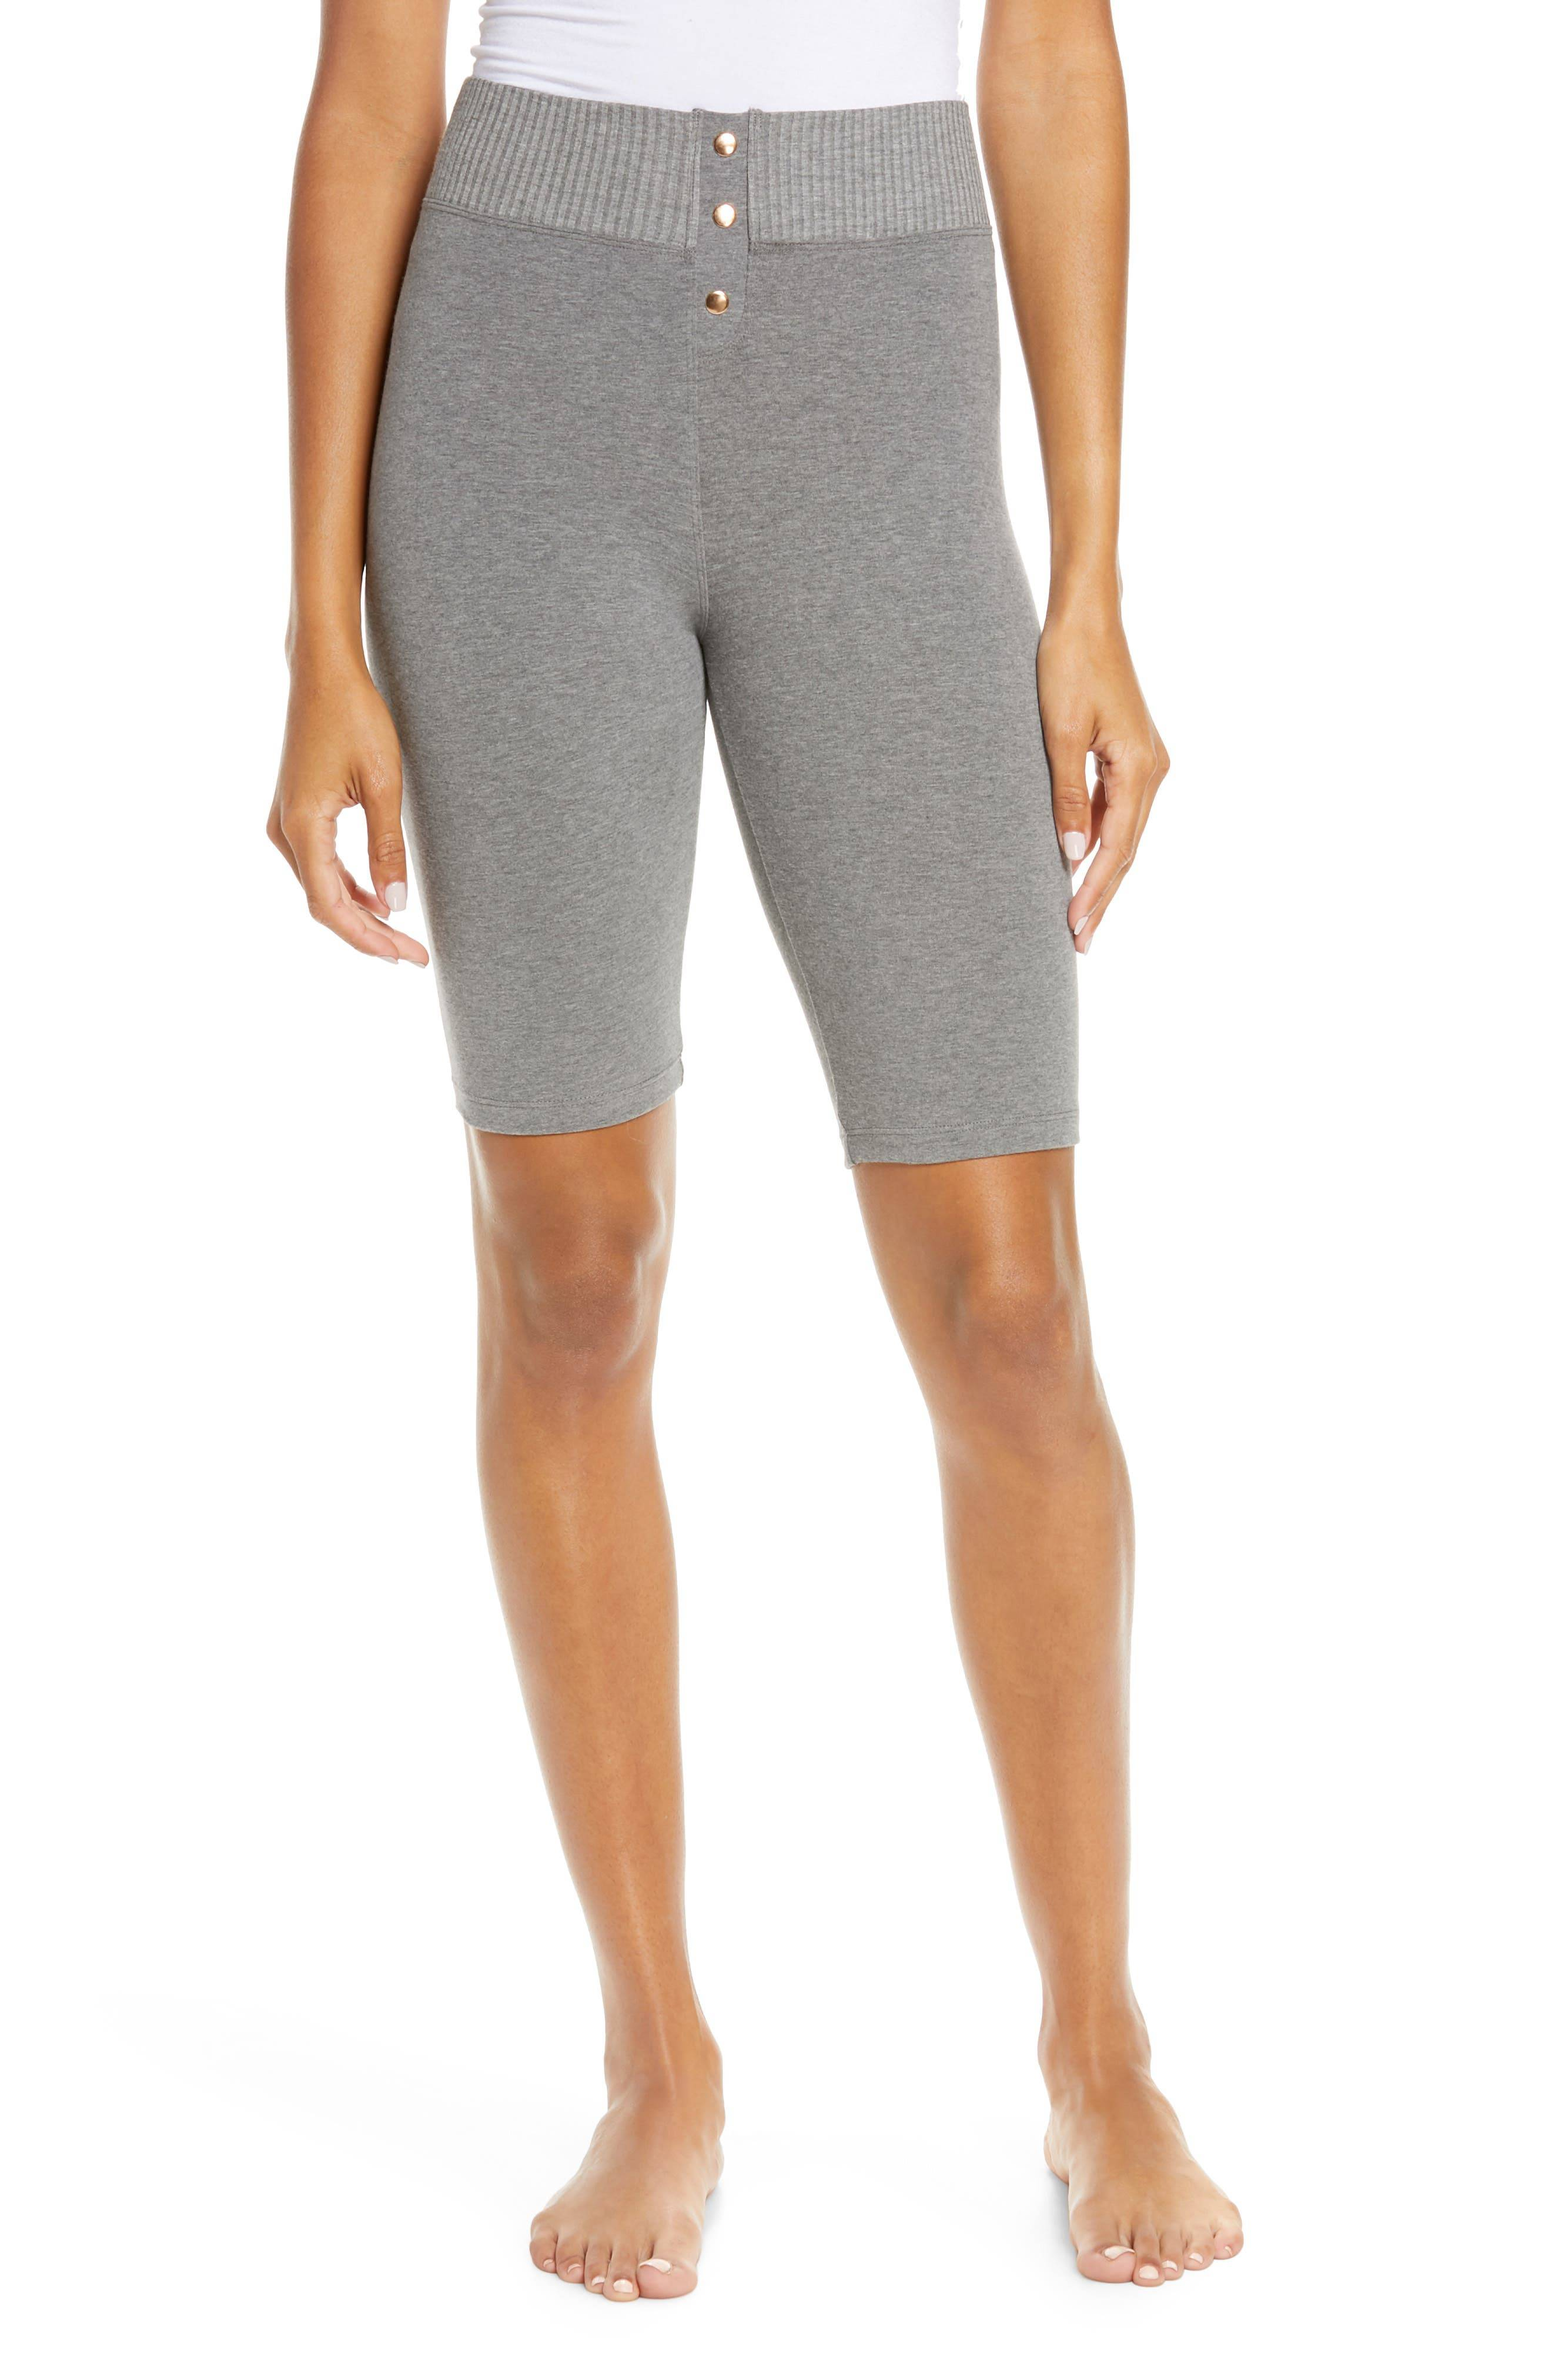 Felina Women's Felina Bike Shorts, Size Medium - Grey